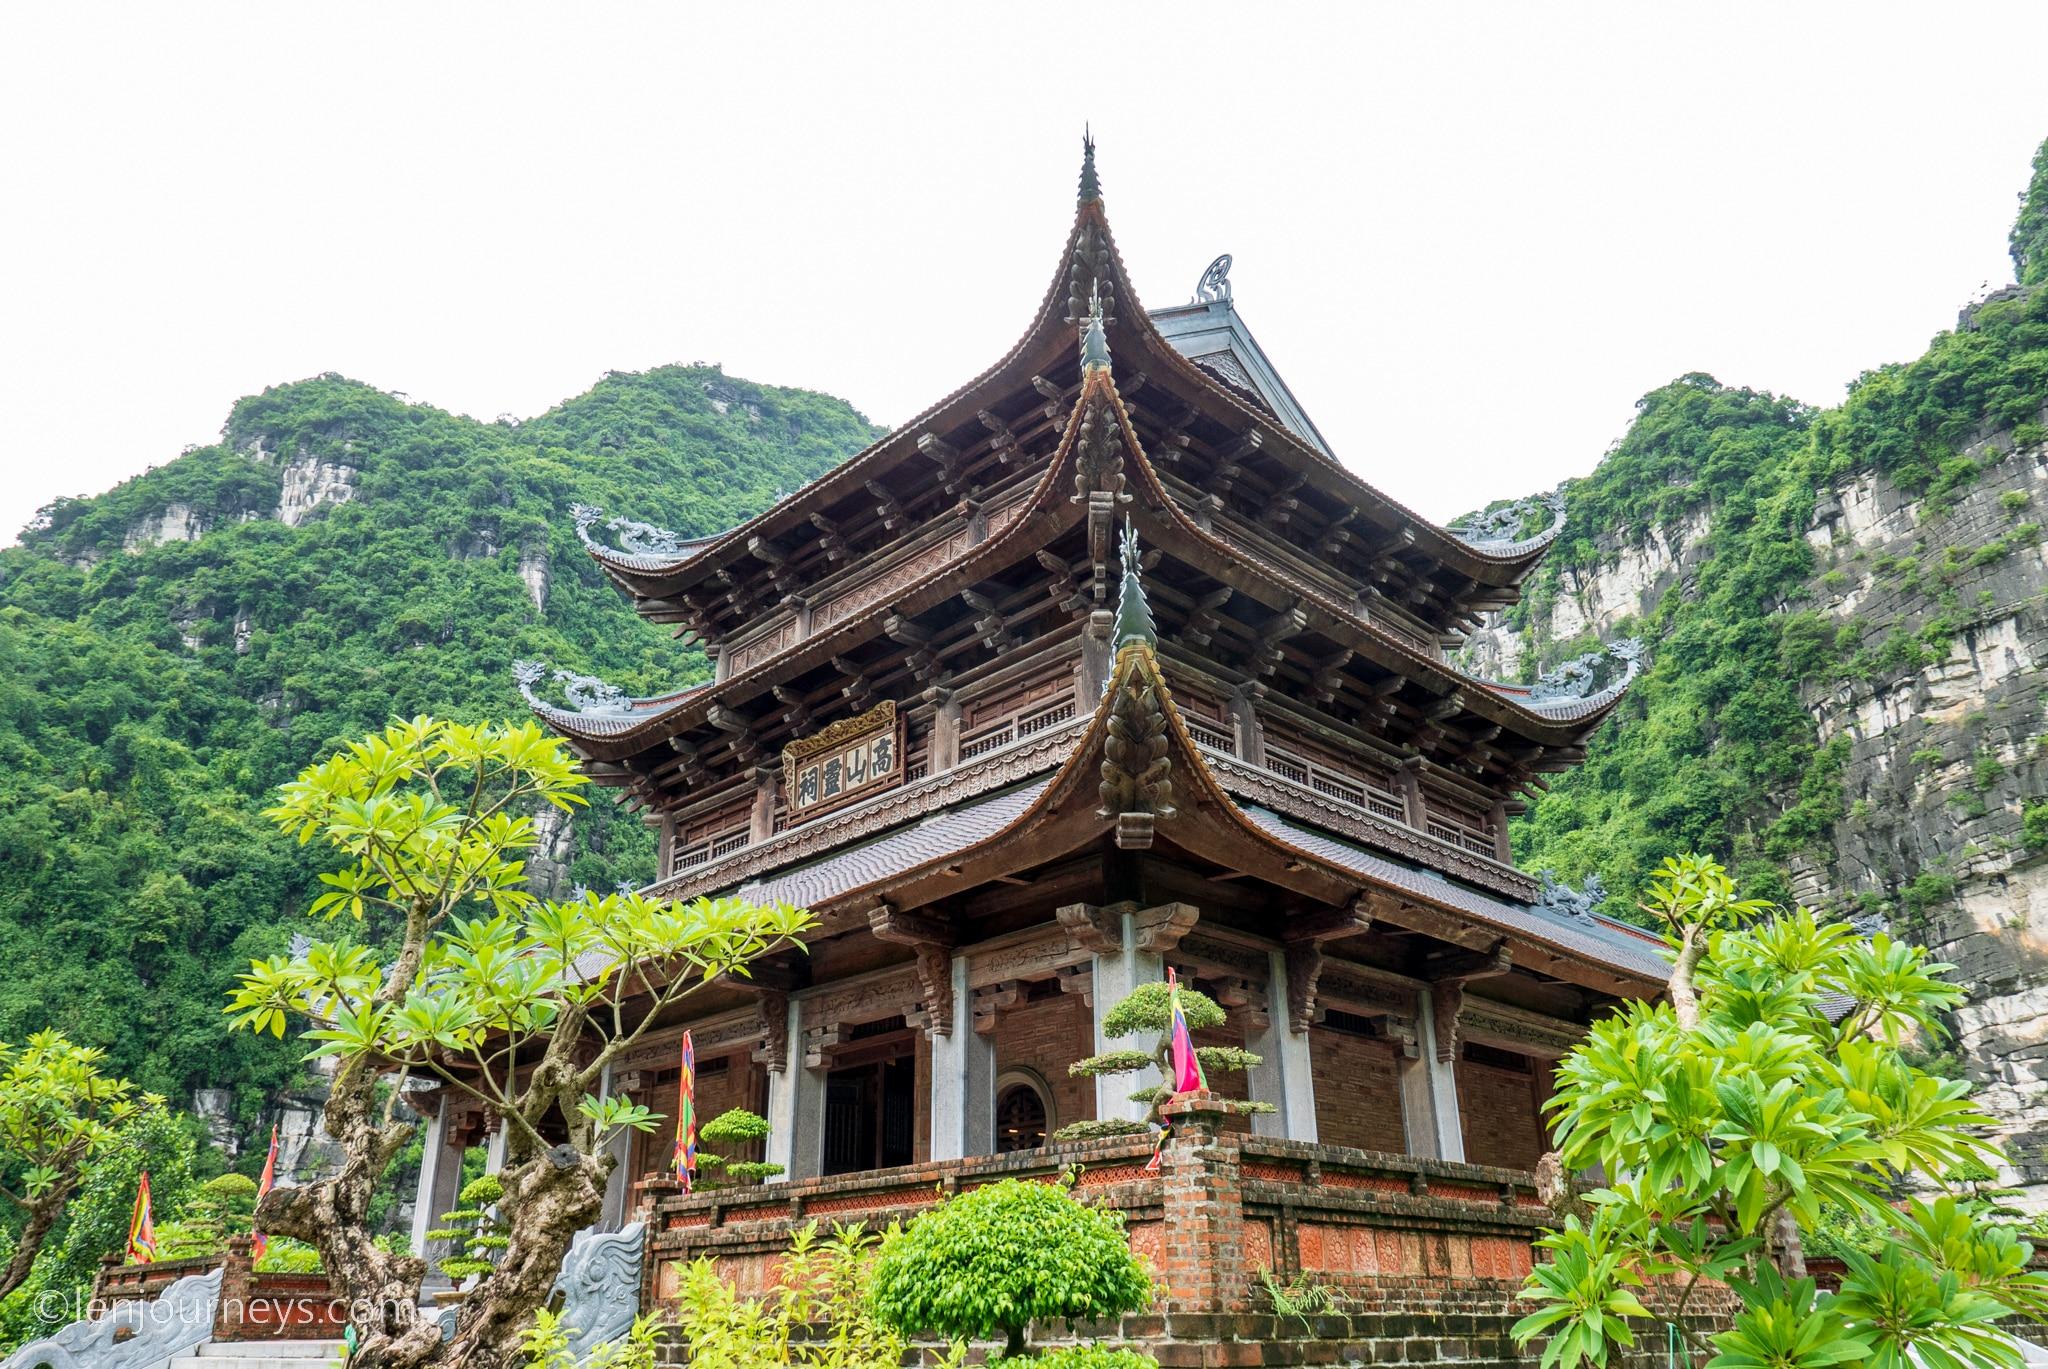 Cao Son Temple at Trang An